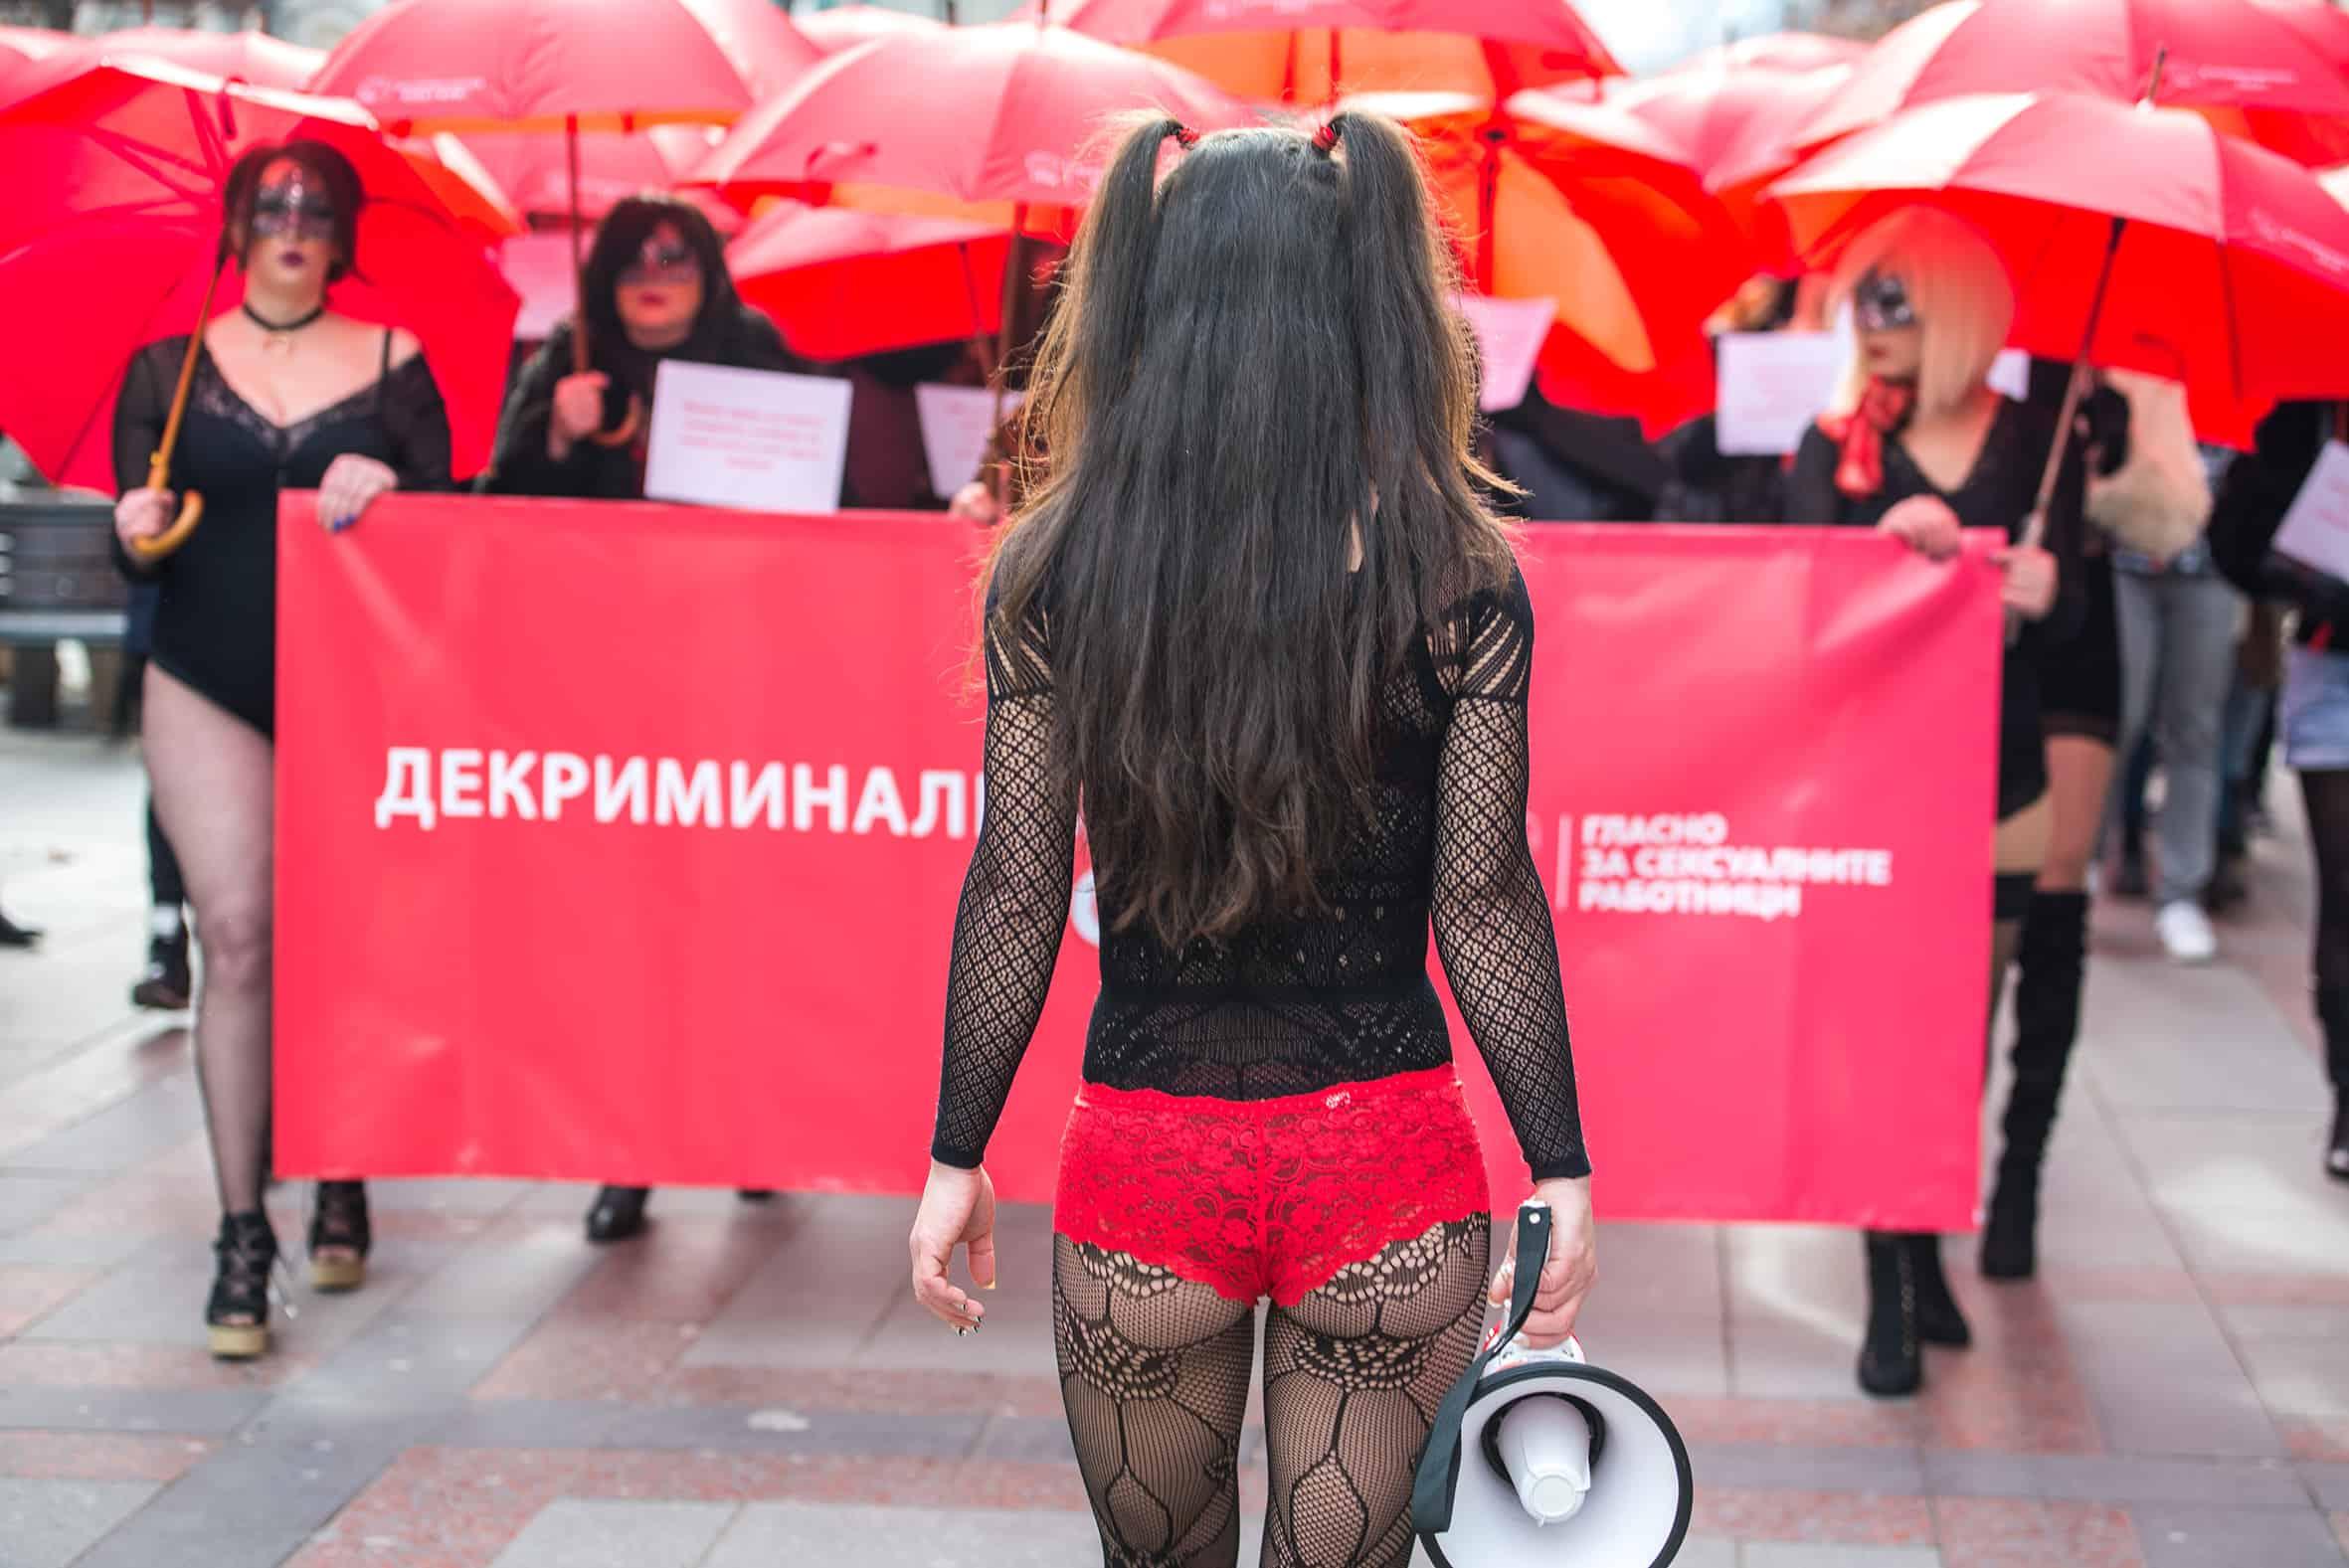 Фотографија: Ванчо Џамбаски